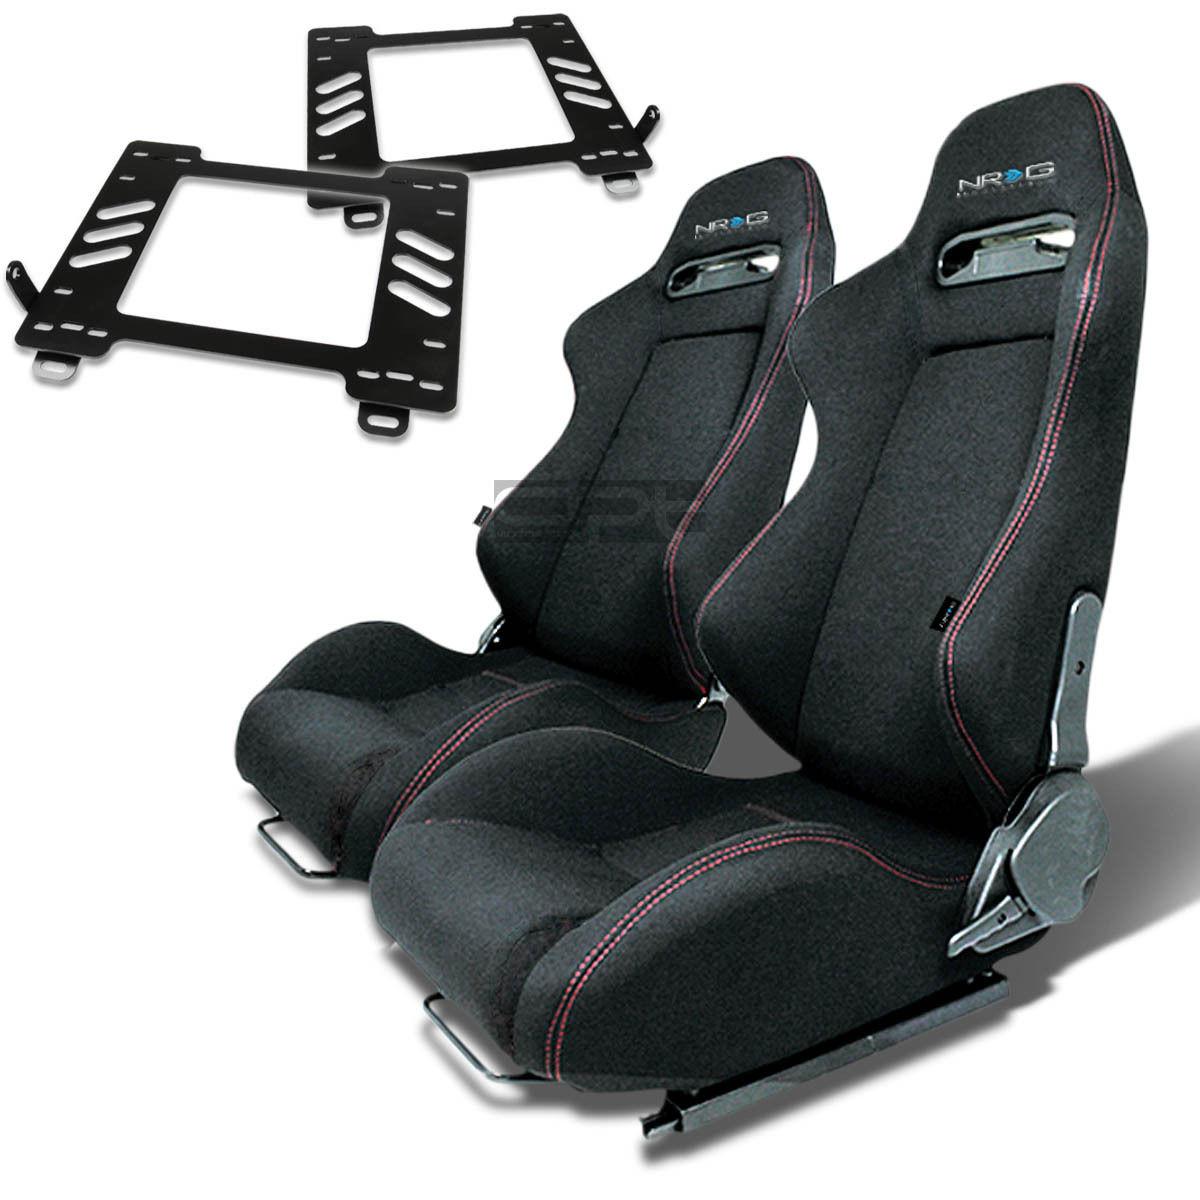 Details about NRG TYPE-R RACING SEAT BLACK CLOTH+SILDER+FOR 89-97 MIATA  MX5/MX-5 NA BRACKET X2